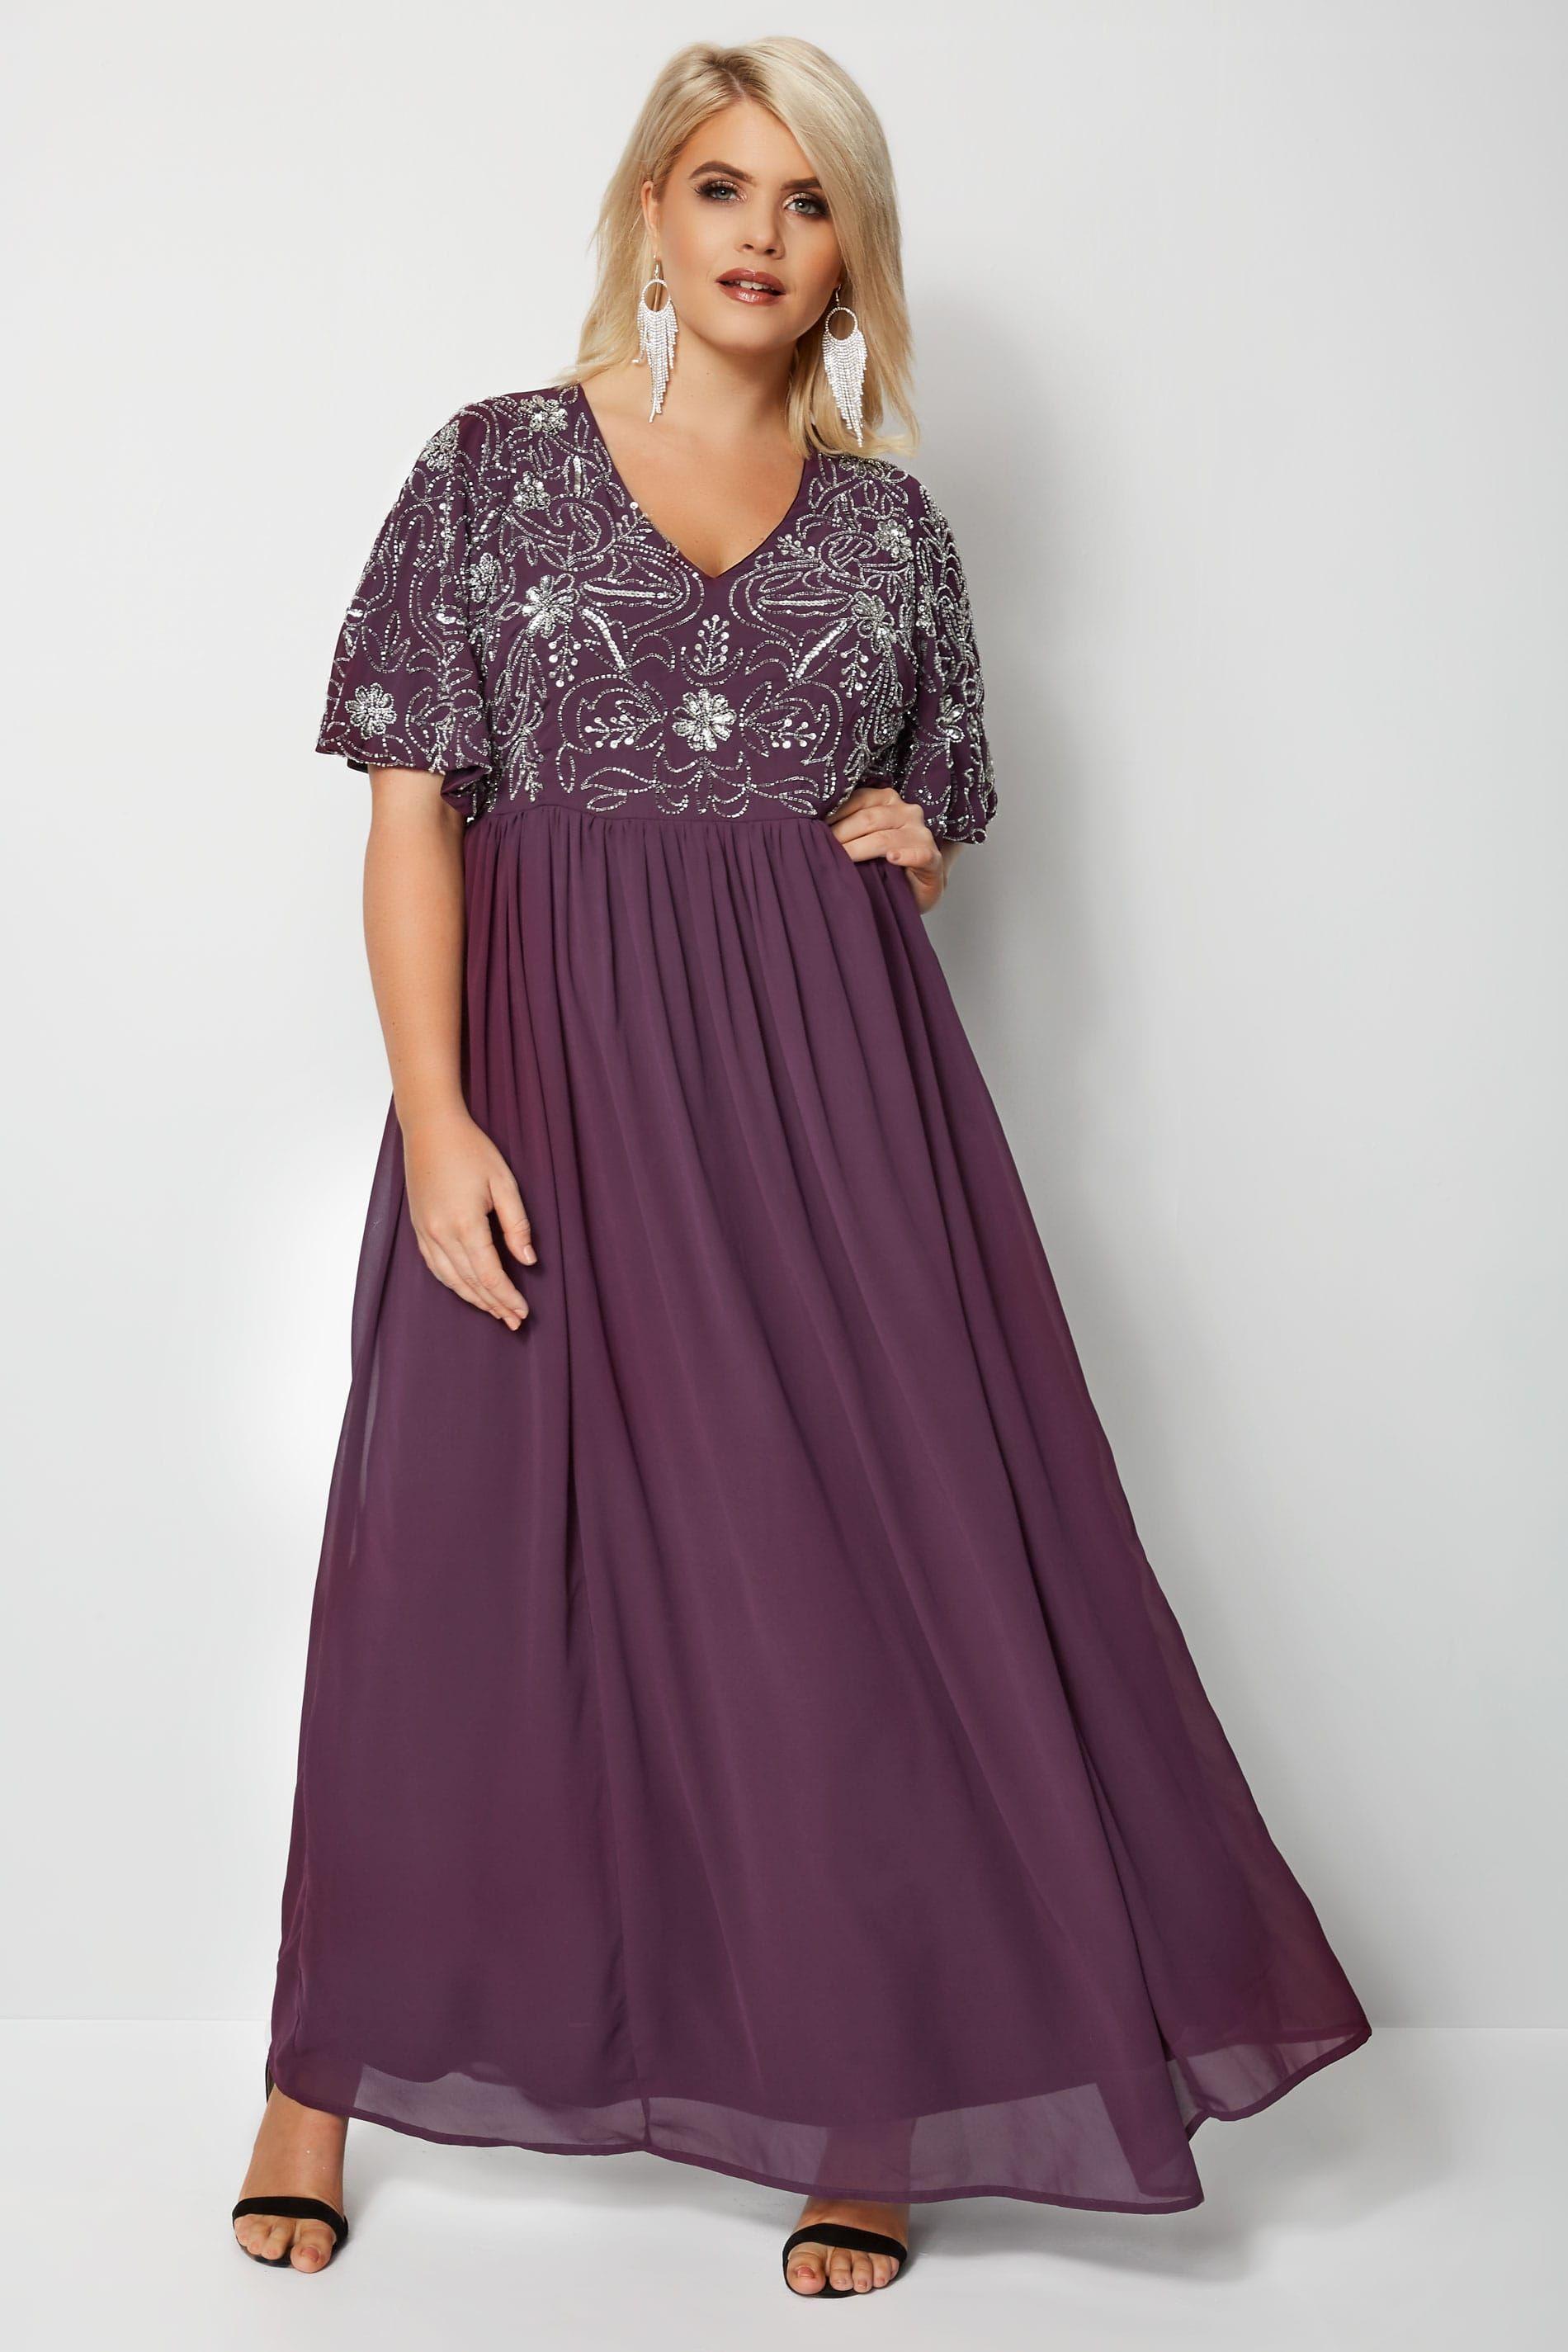 8fa7b9591f3 Embellished Maxi Dress Size 16 | Huston Fislar Photography